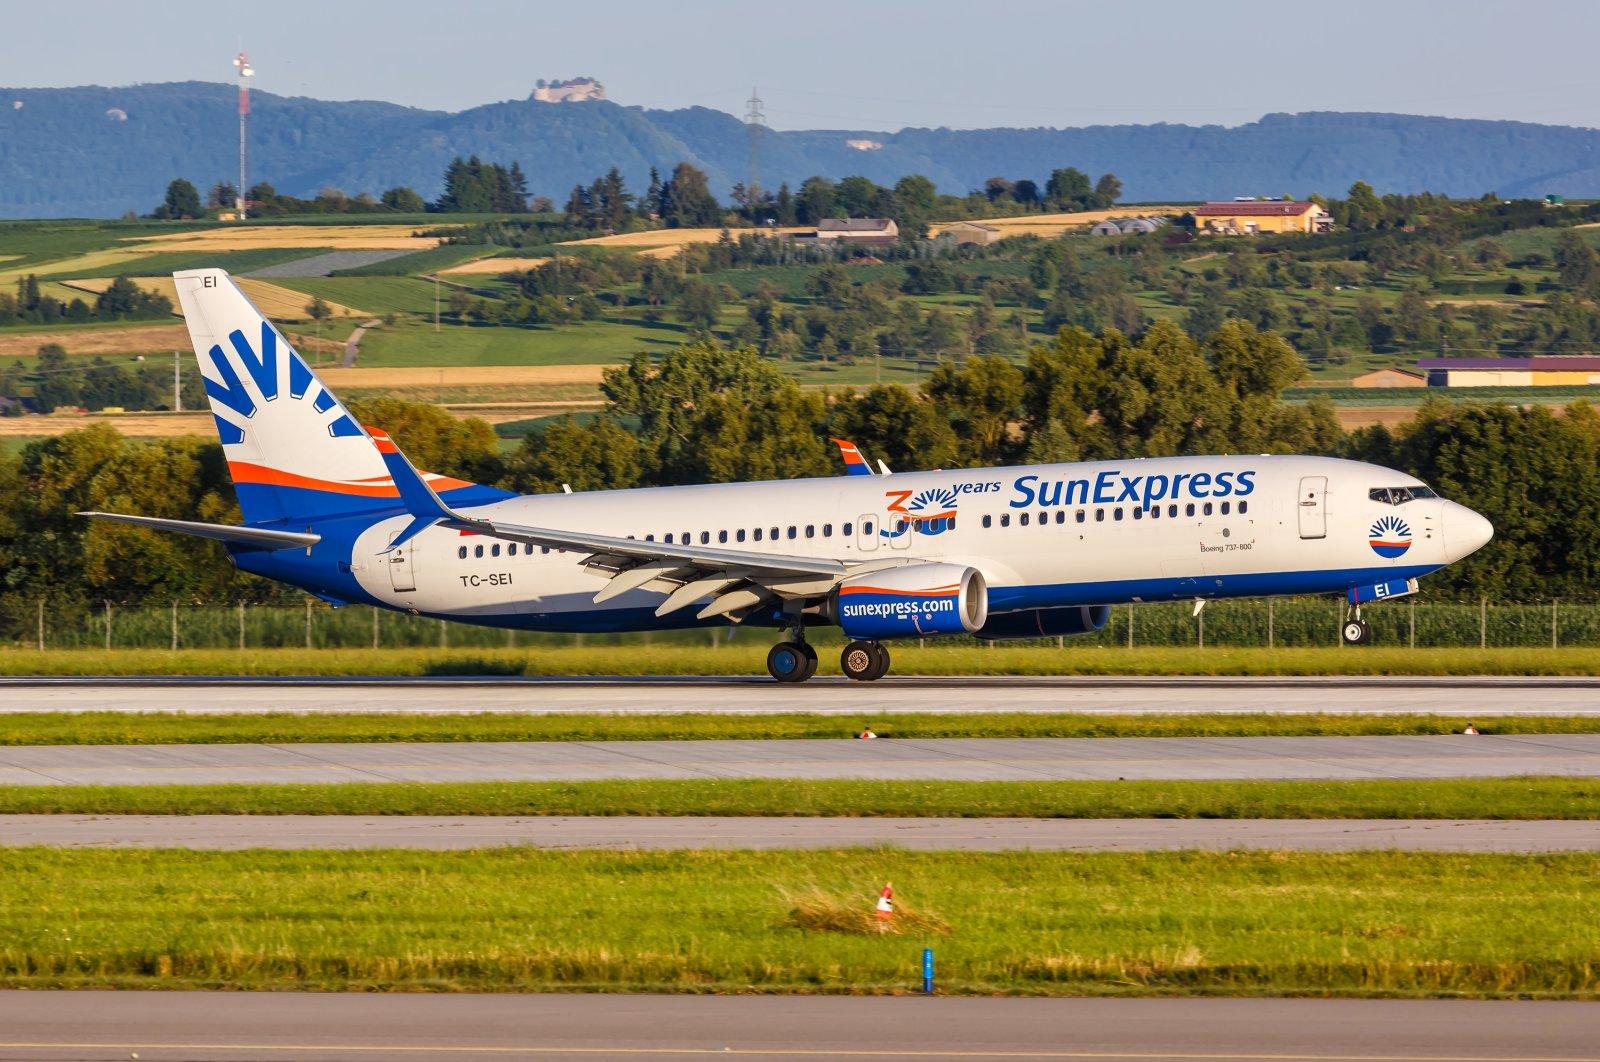 A SunExpress Boeing 737-800 aircraft lands at Stuttgart Airport in Germany, July 9, 2020. (Shutterstock Photo)